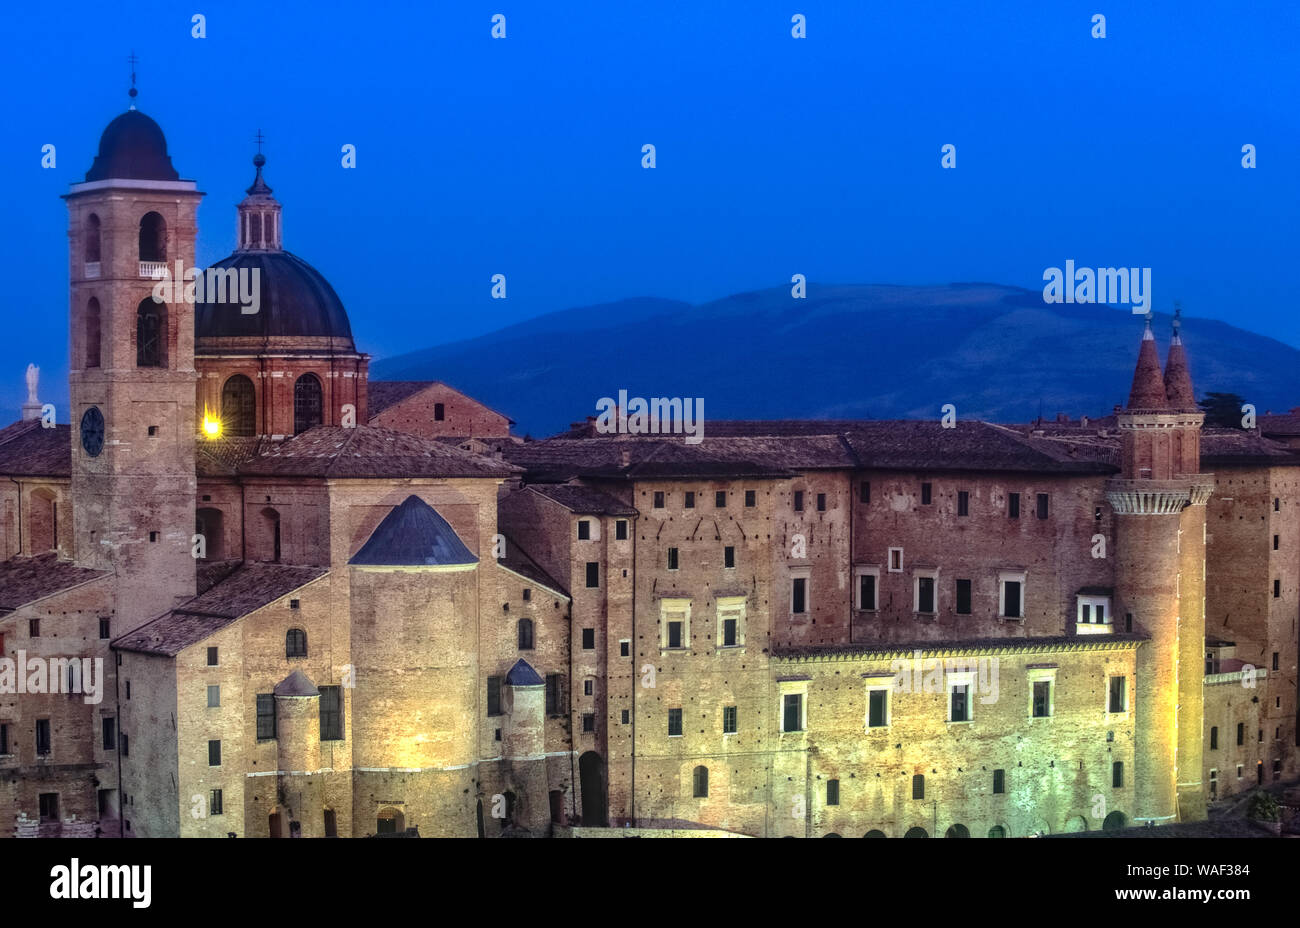 Palazzo Blu Stock Photos Palazzo Blu Stock Images Alamy